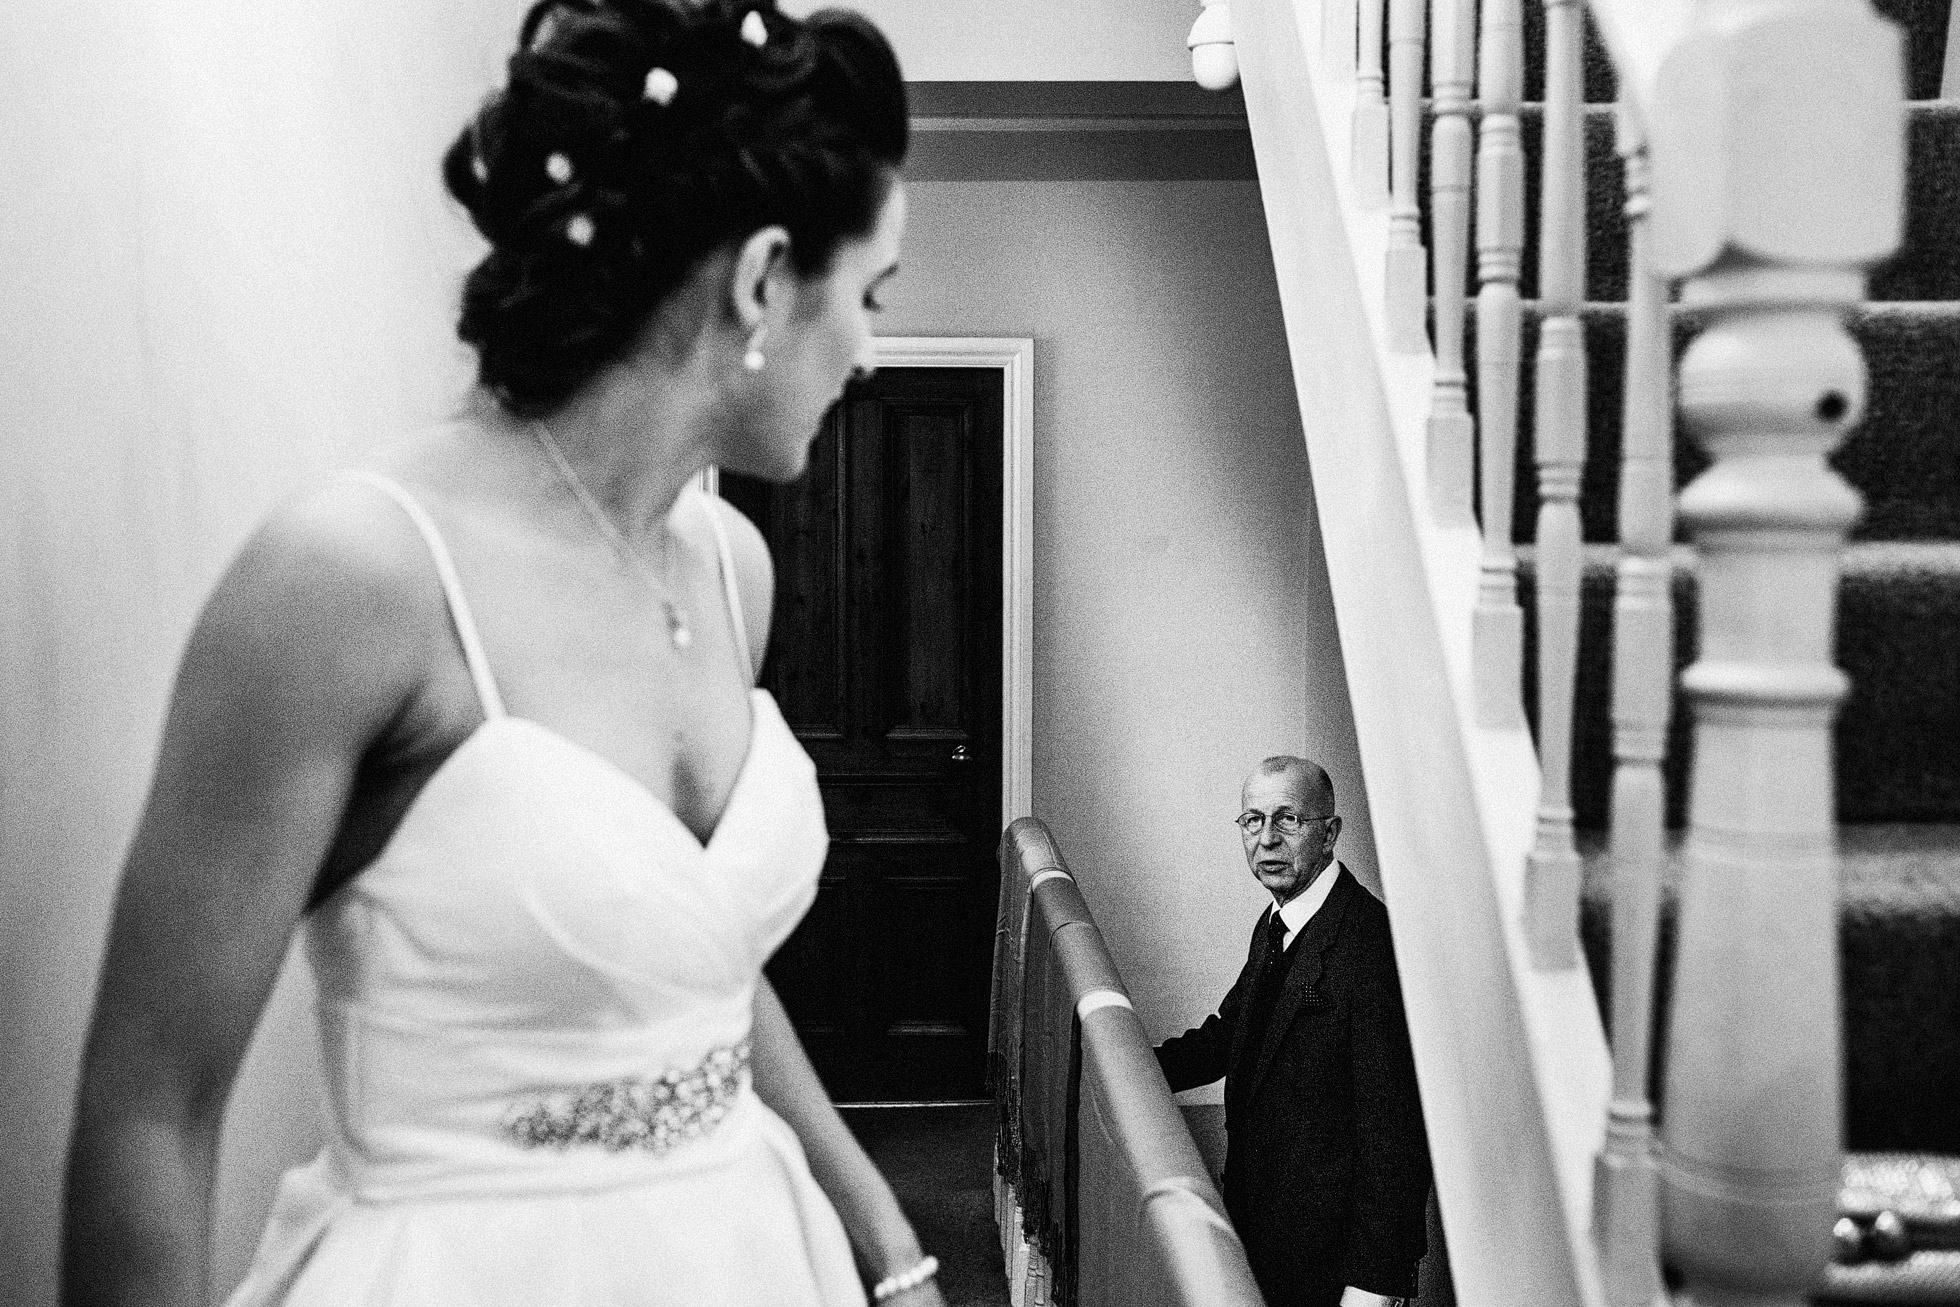 Barmbyfield Barn Bridal Preparations Black and White